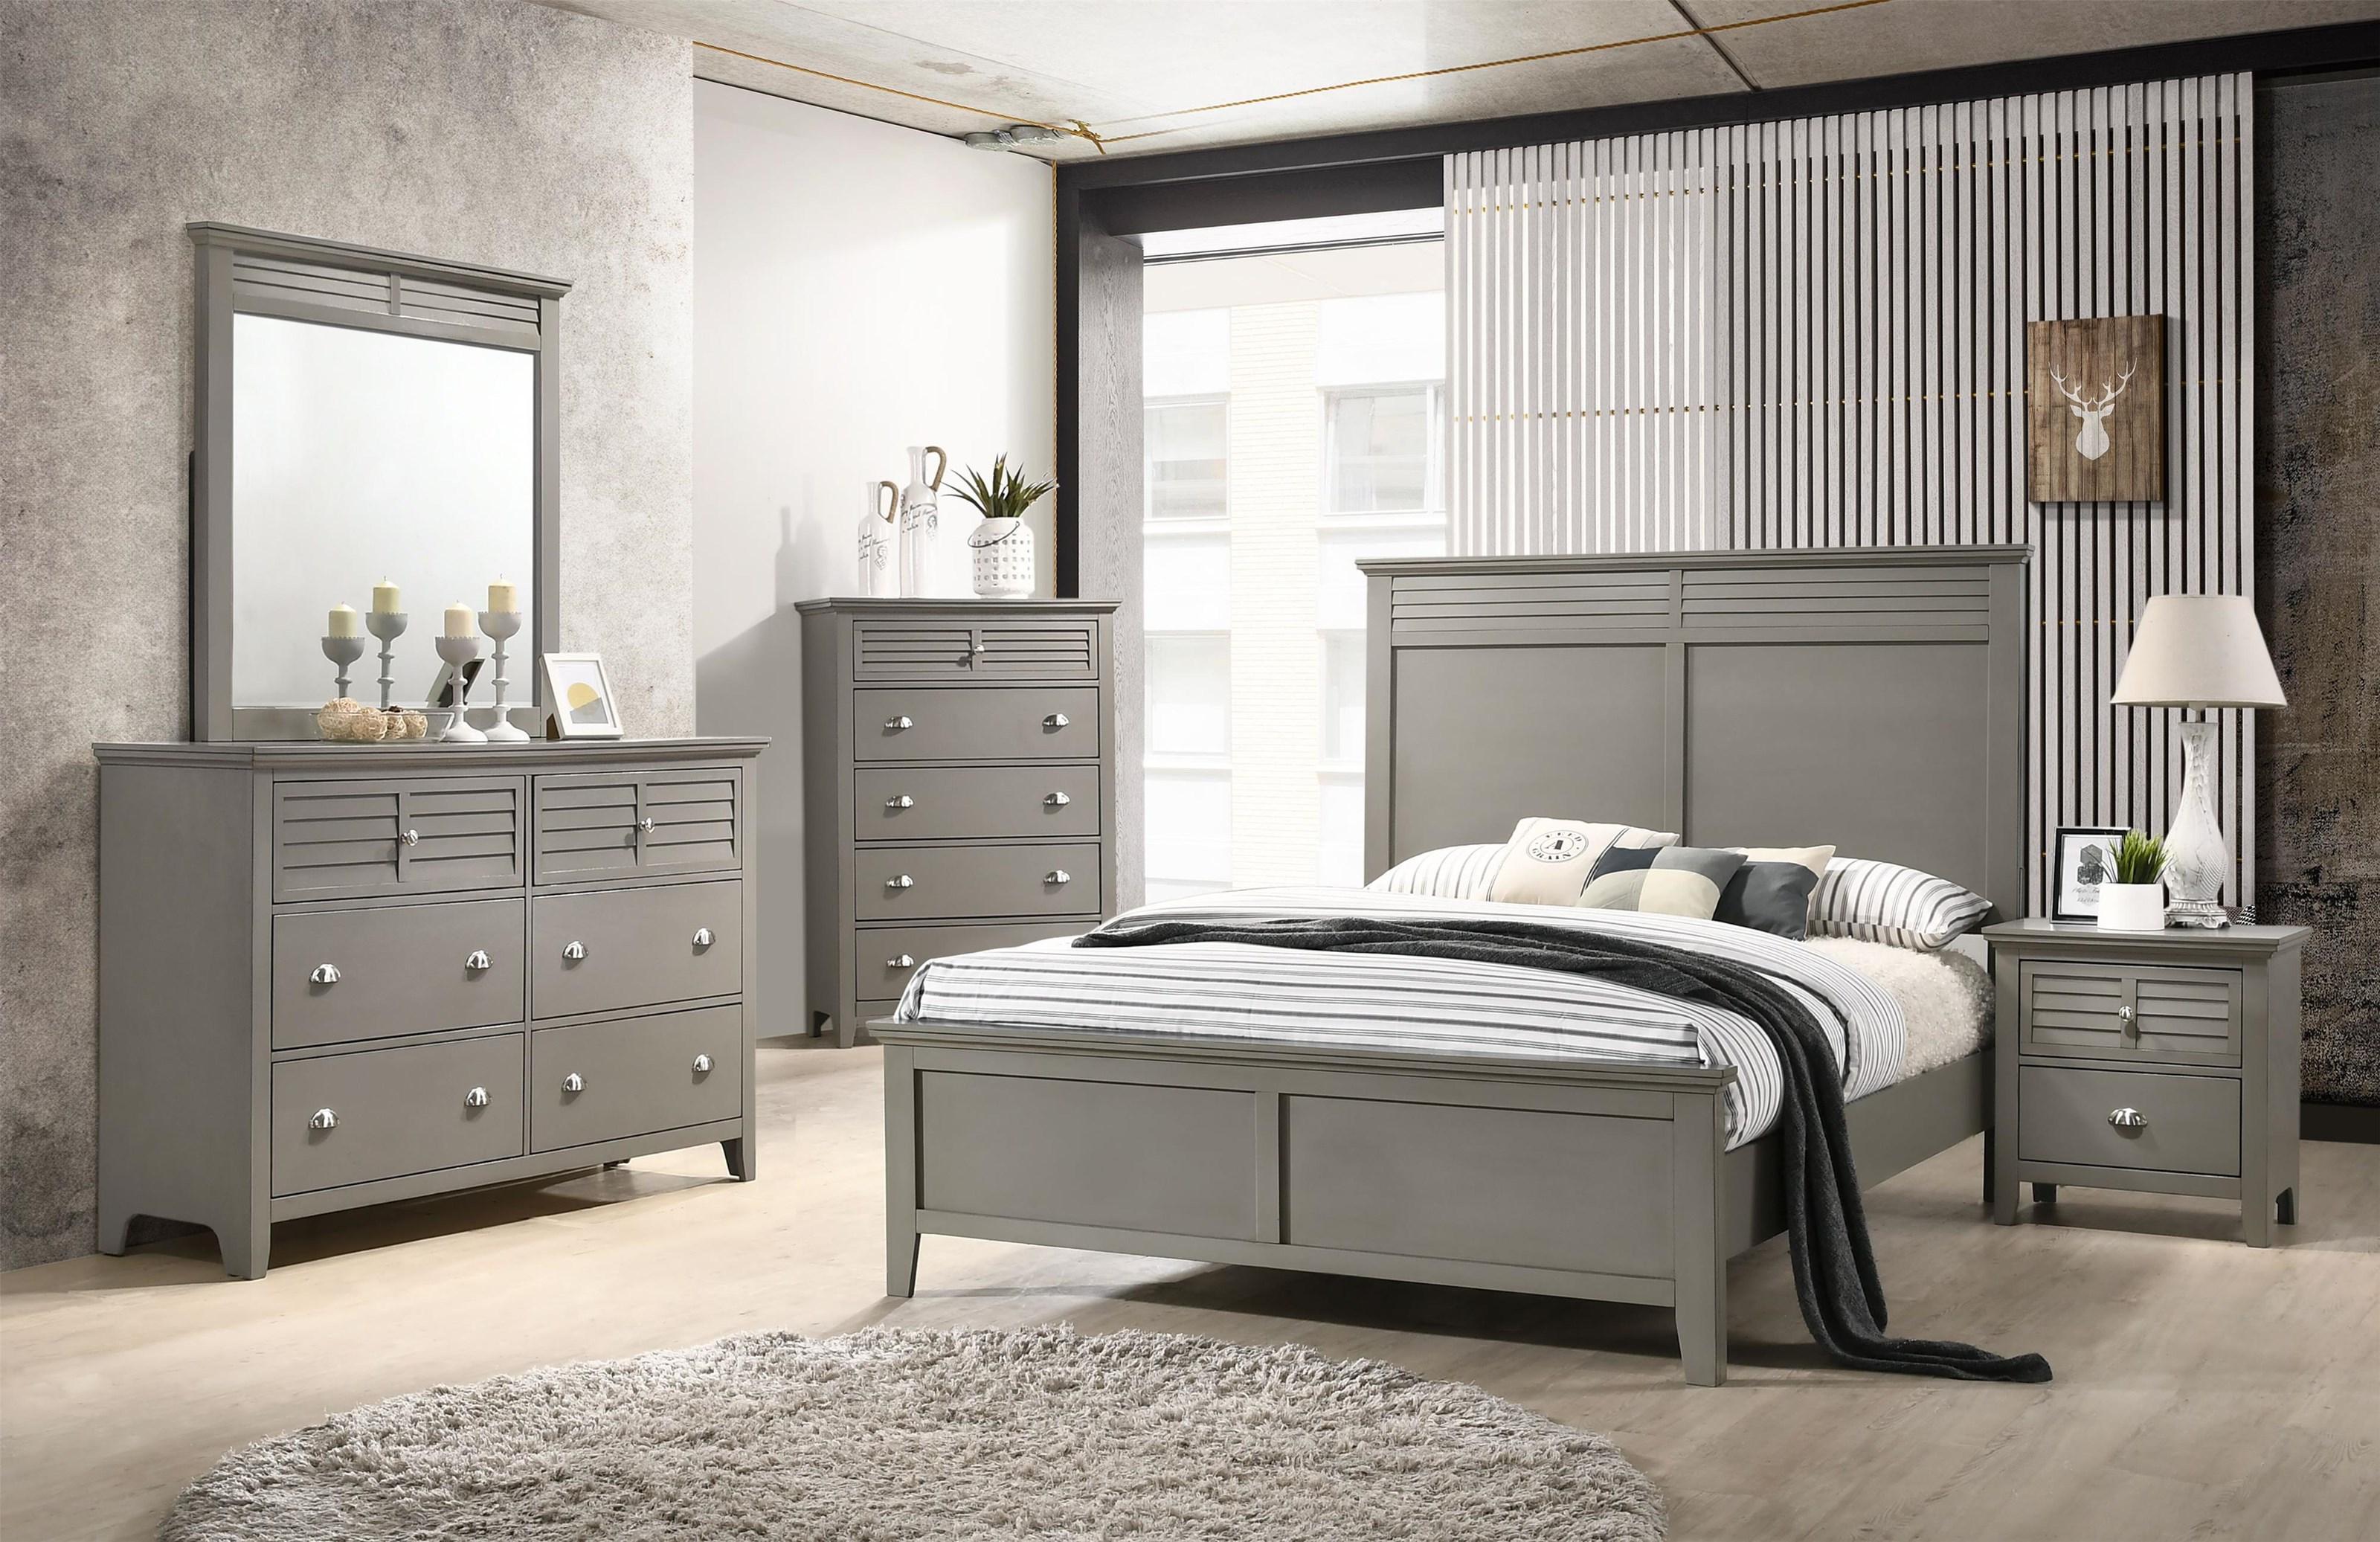 C7313GREY White Bedroom Group shot by Lifestyle at Furniture Fair - North Carolina